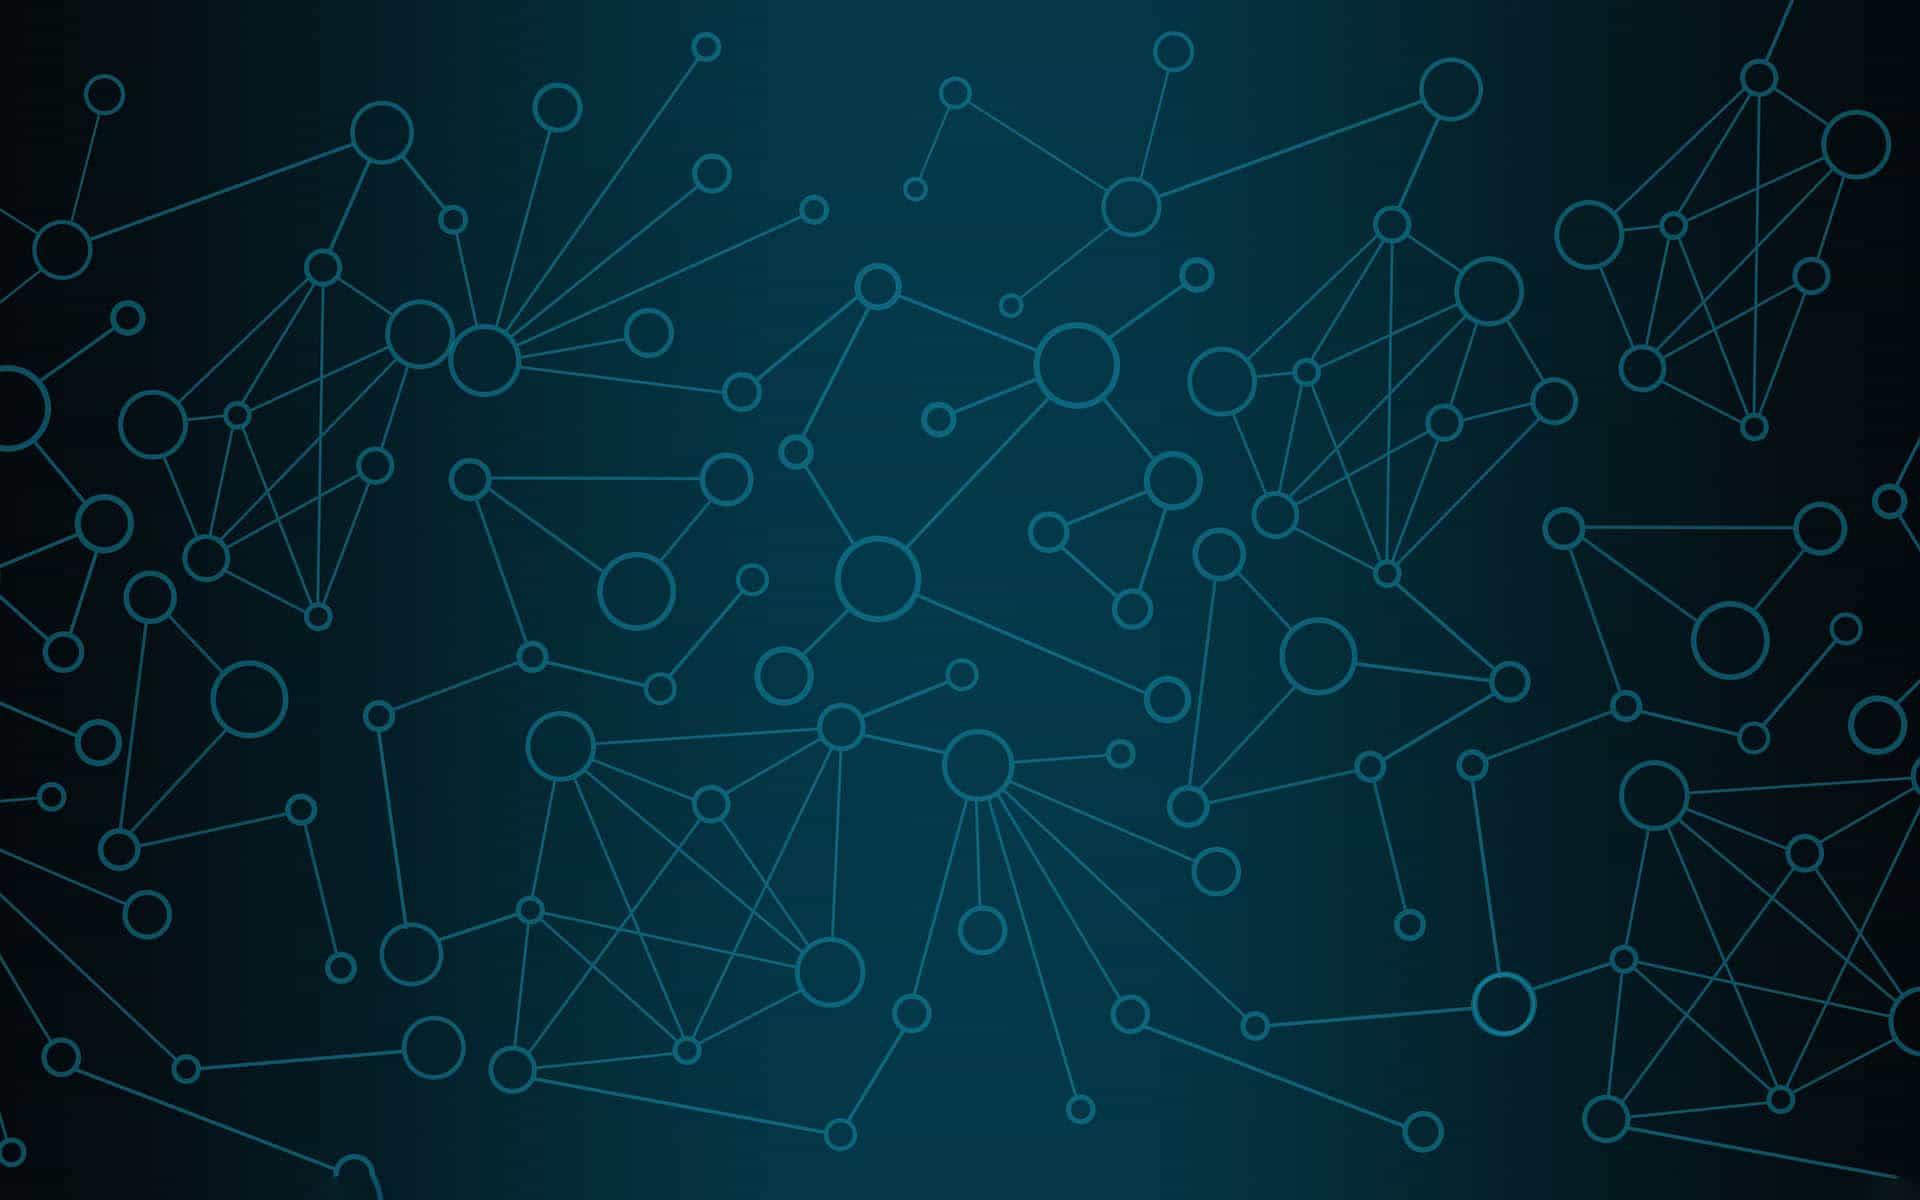 network-laclaree-fond